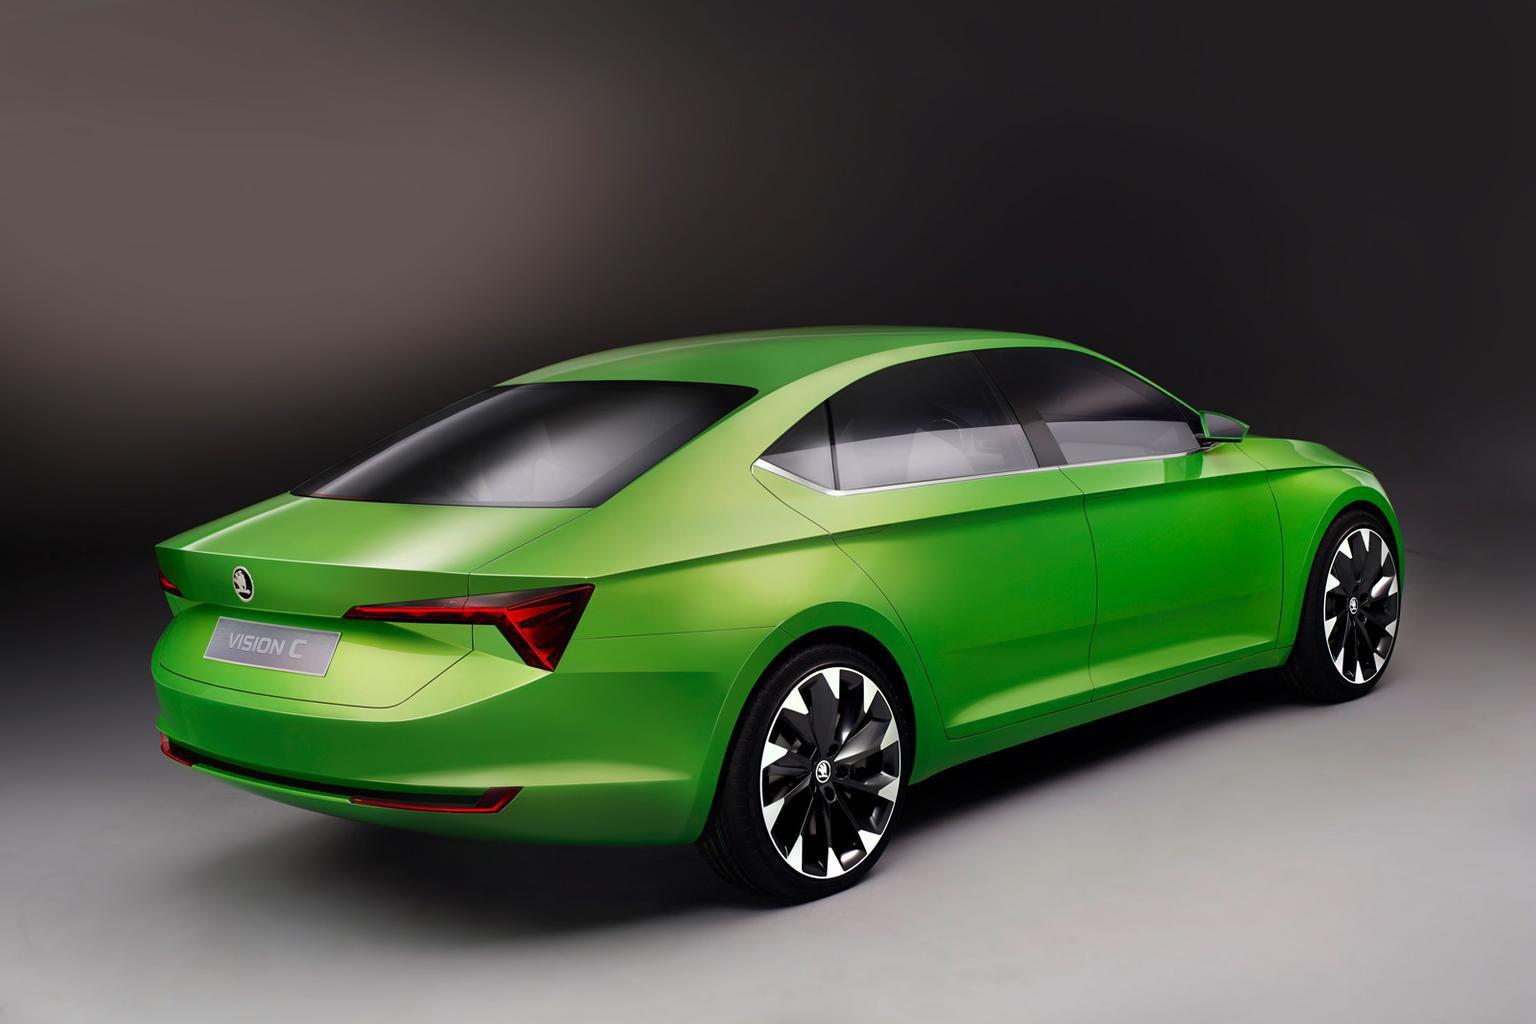 Skoda VisionC five-door coupe concept revealed